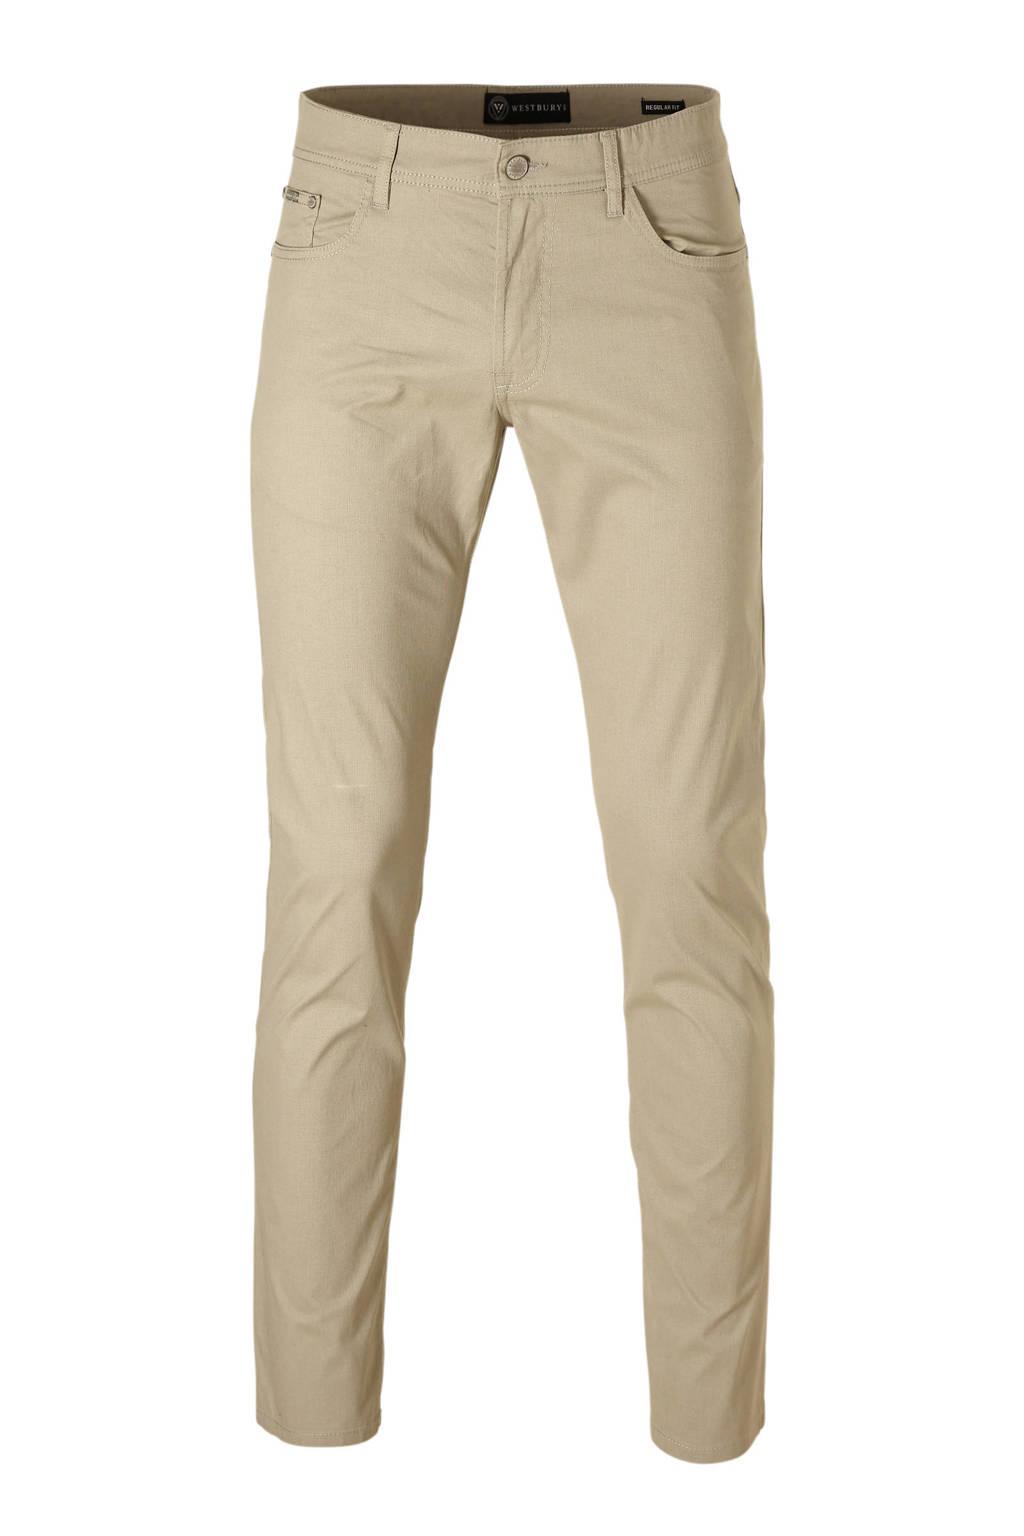 C&A Westbury regular fit broek beige, Beige